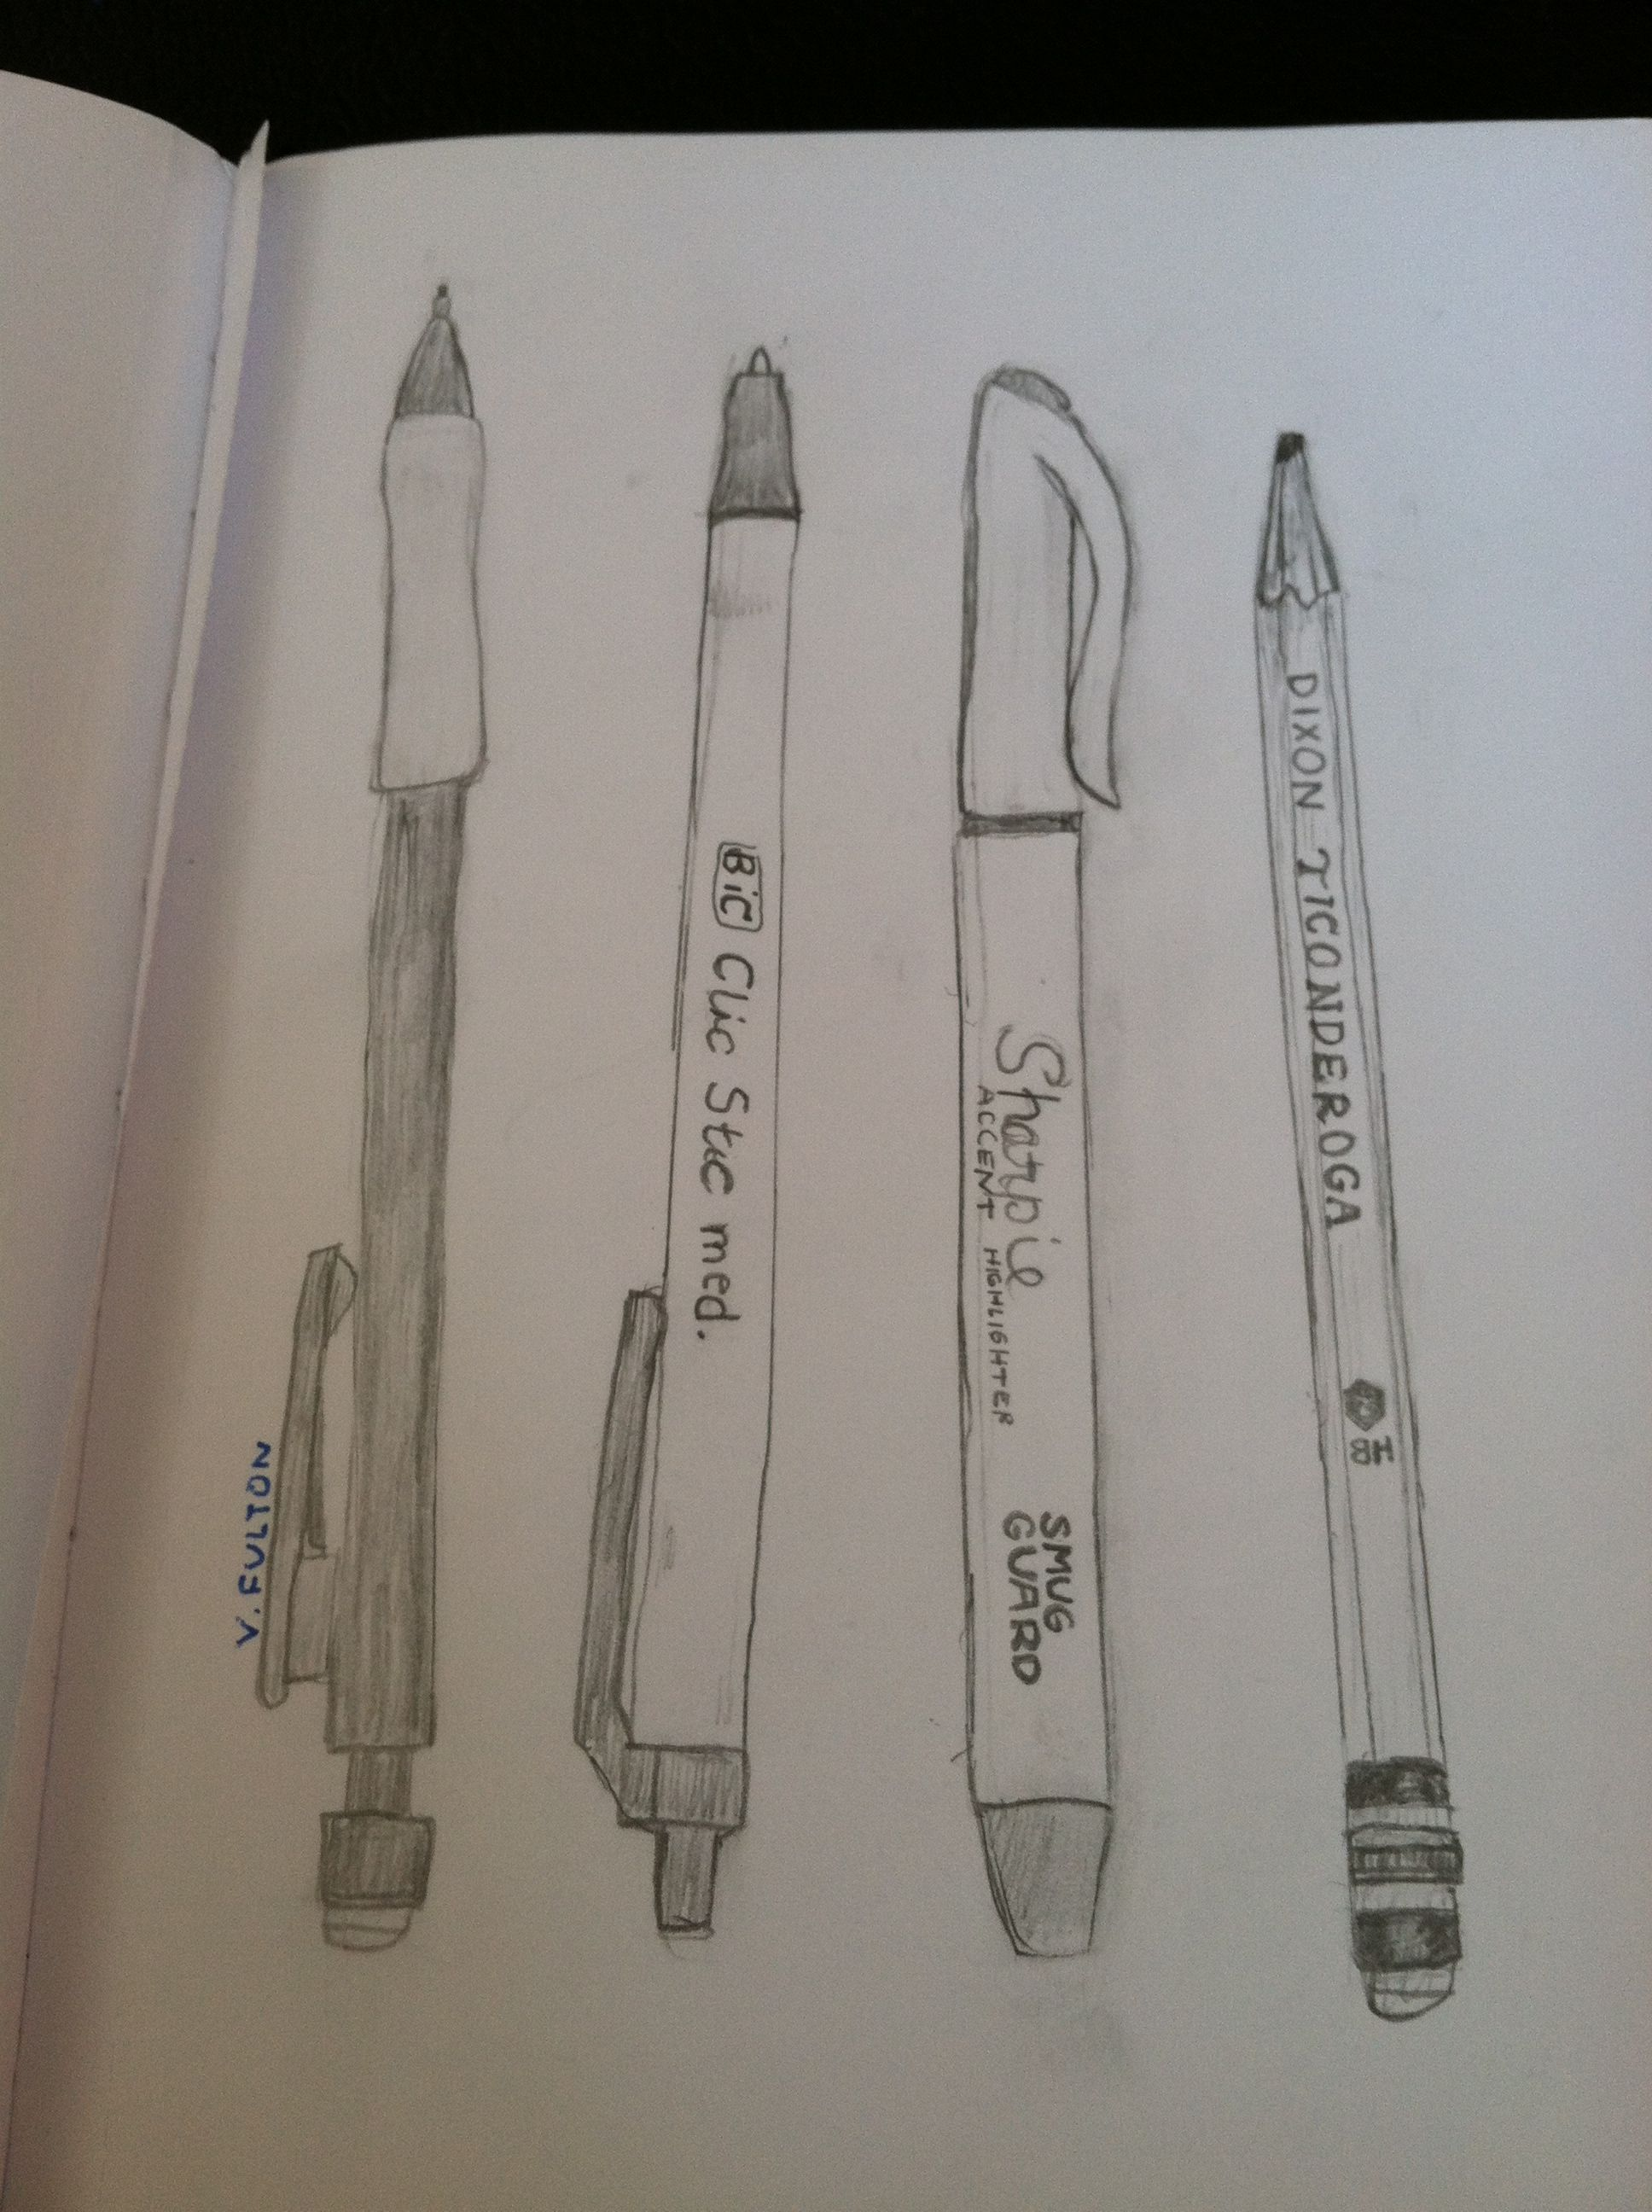 Sketch pencil drawing of pencils pens sharpie